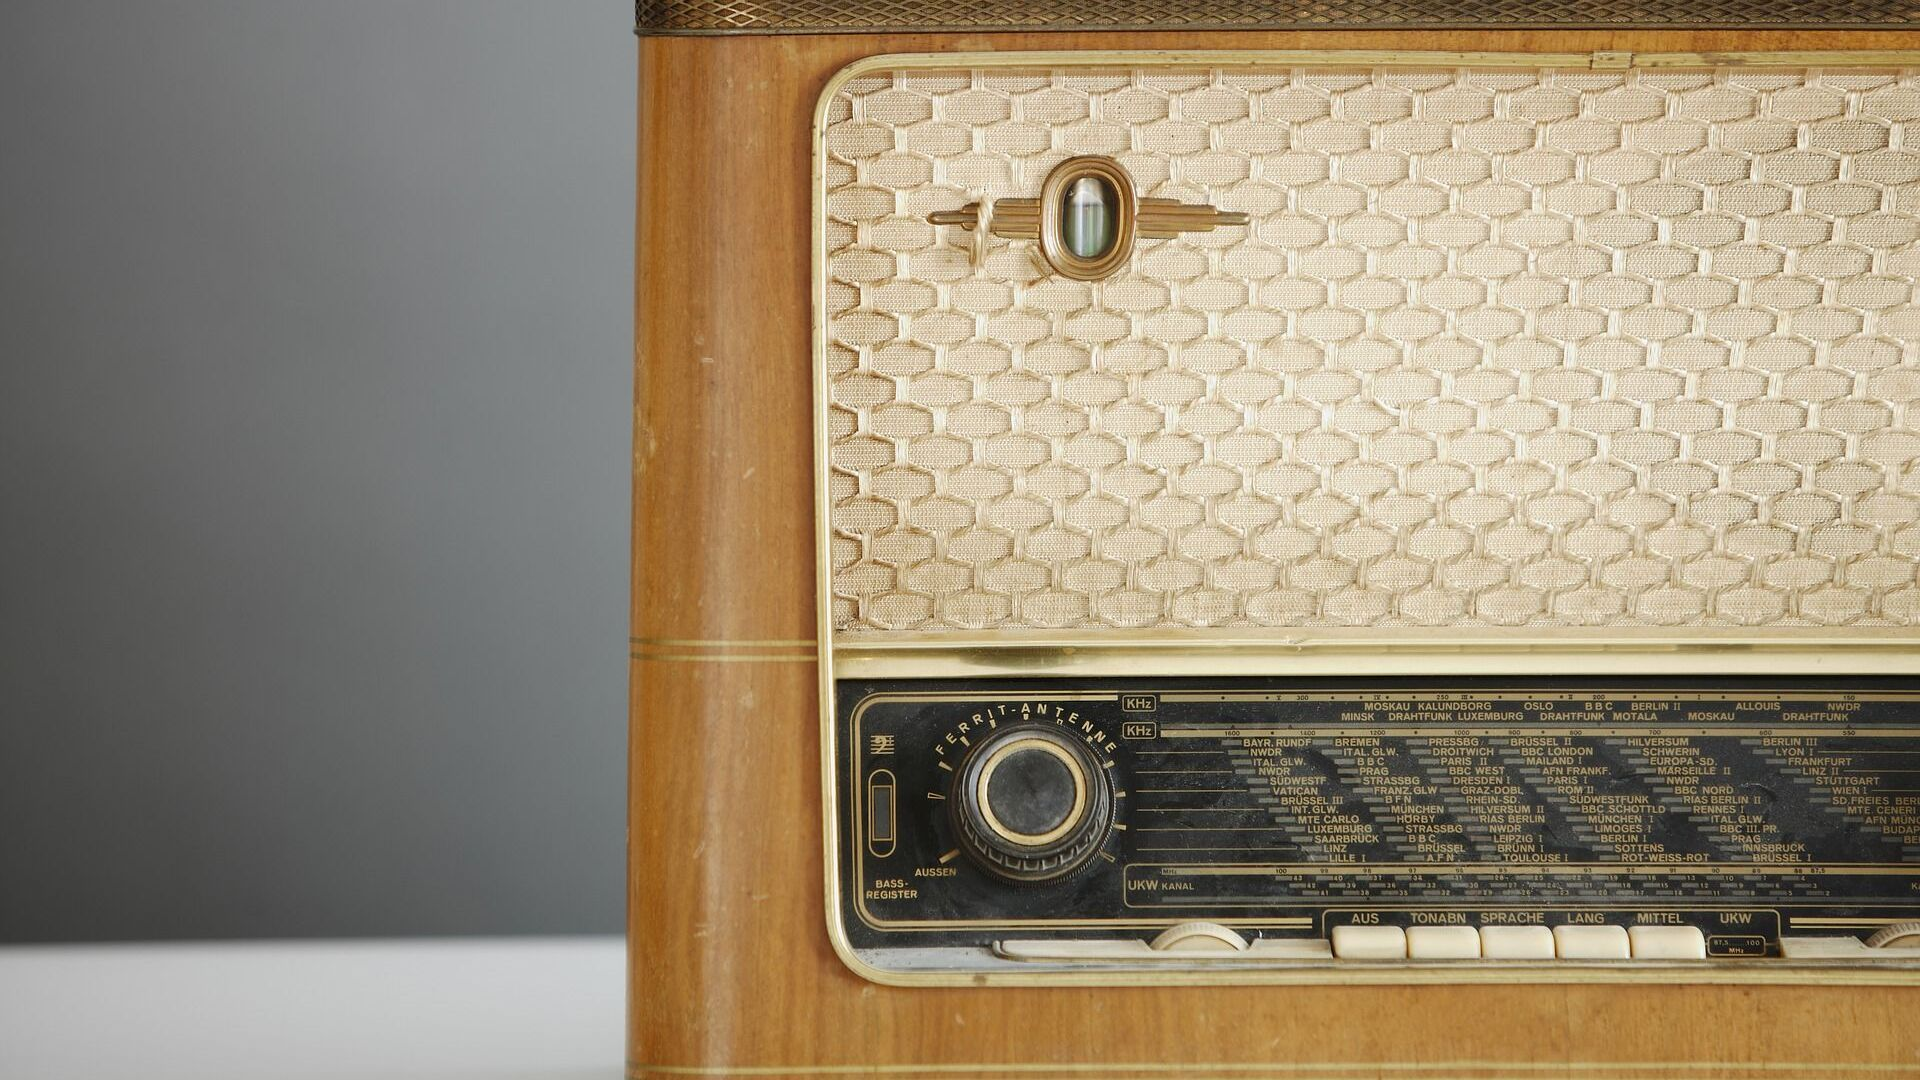 Un radio viejo (imagen referencial) - Sputnik Mundo, 1920, 26.01.2021